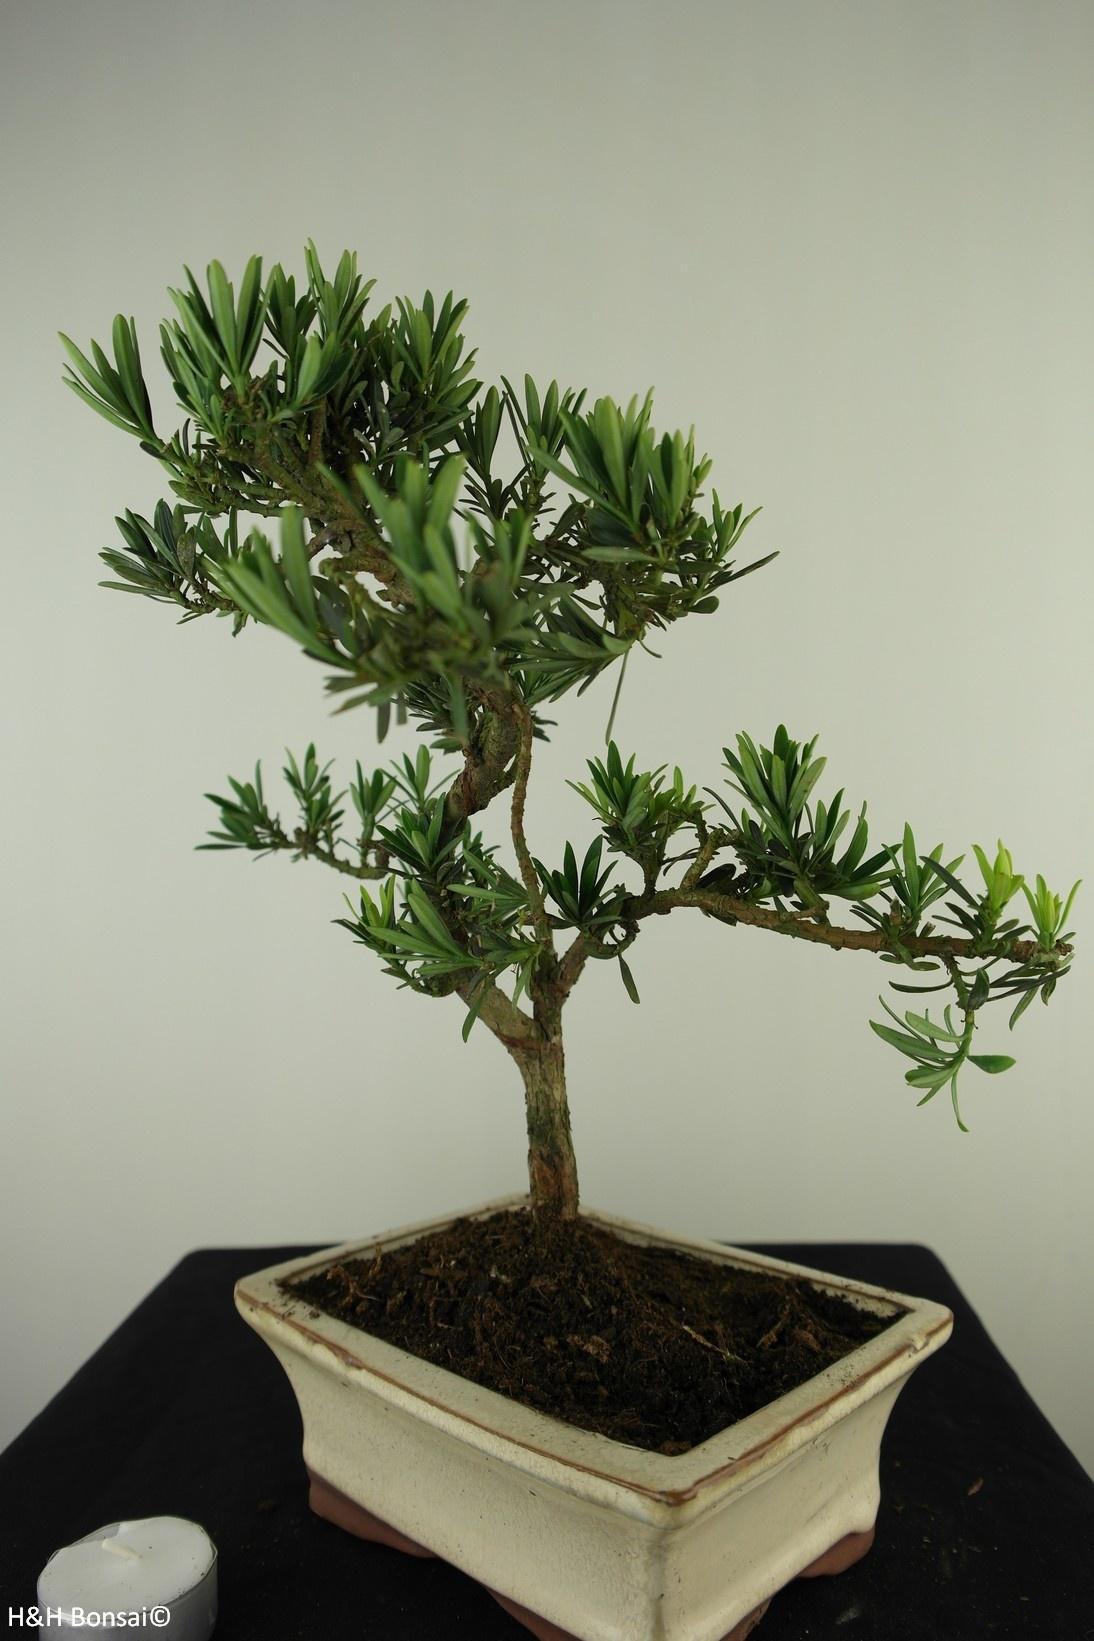 Bonsai Chin. Steineibe, Podocarpus, nr. 7715